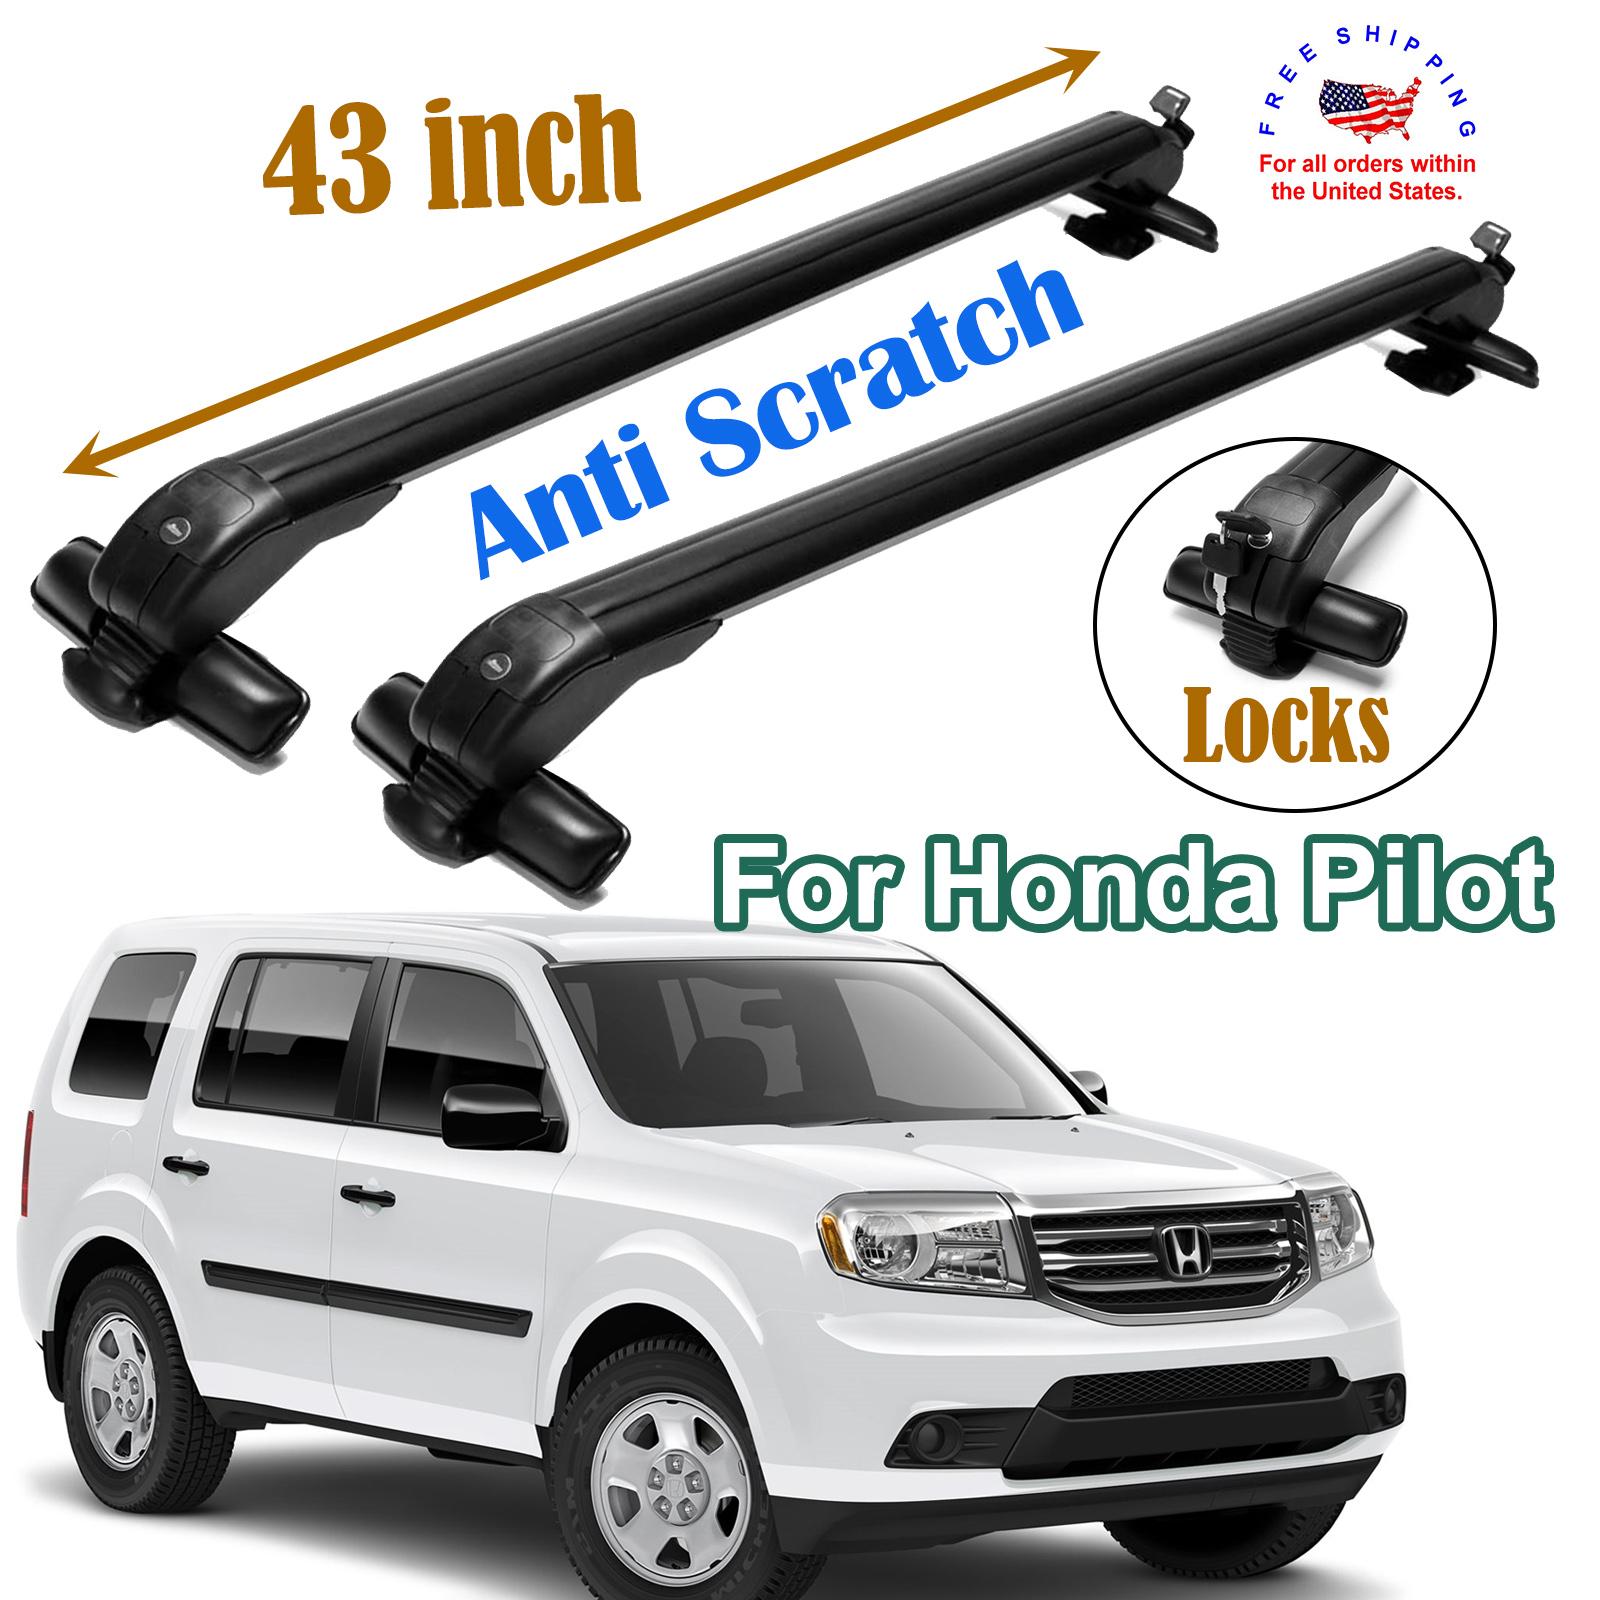 Aluminum Car Top Luggage Roof Rack Cross Bar Carrier Adjustable 82-92cm w// Locks